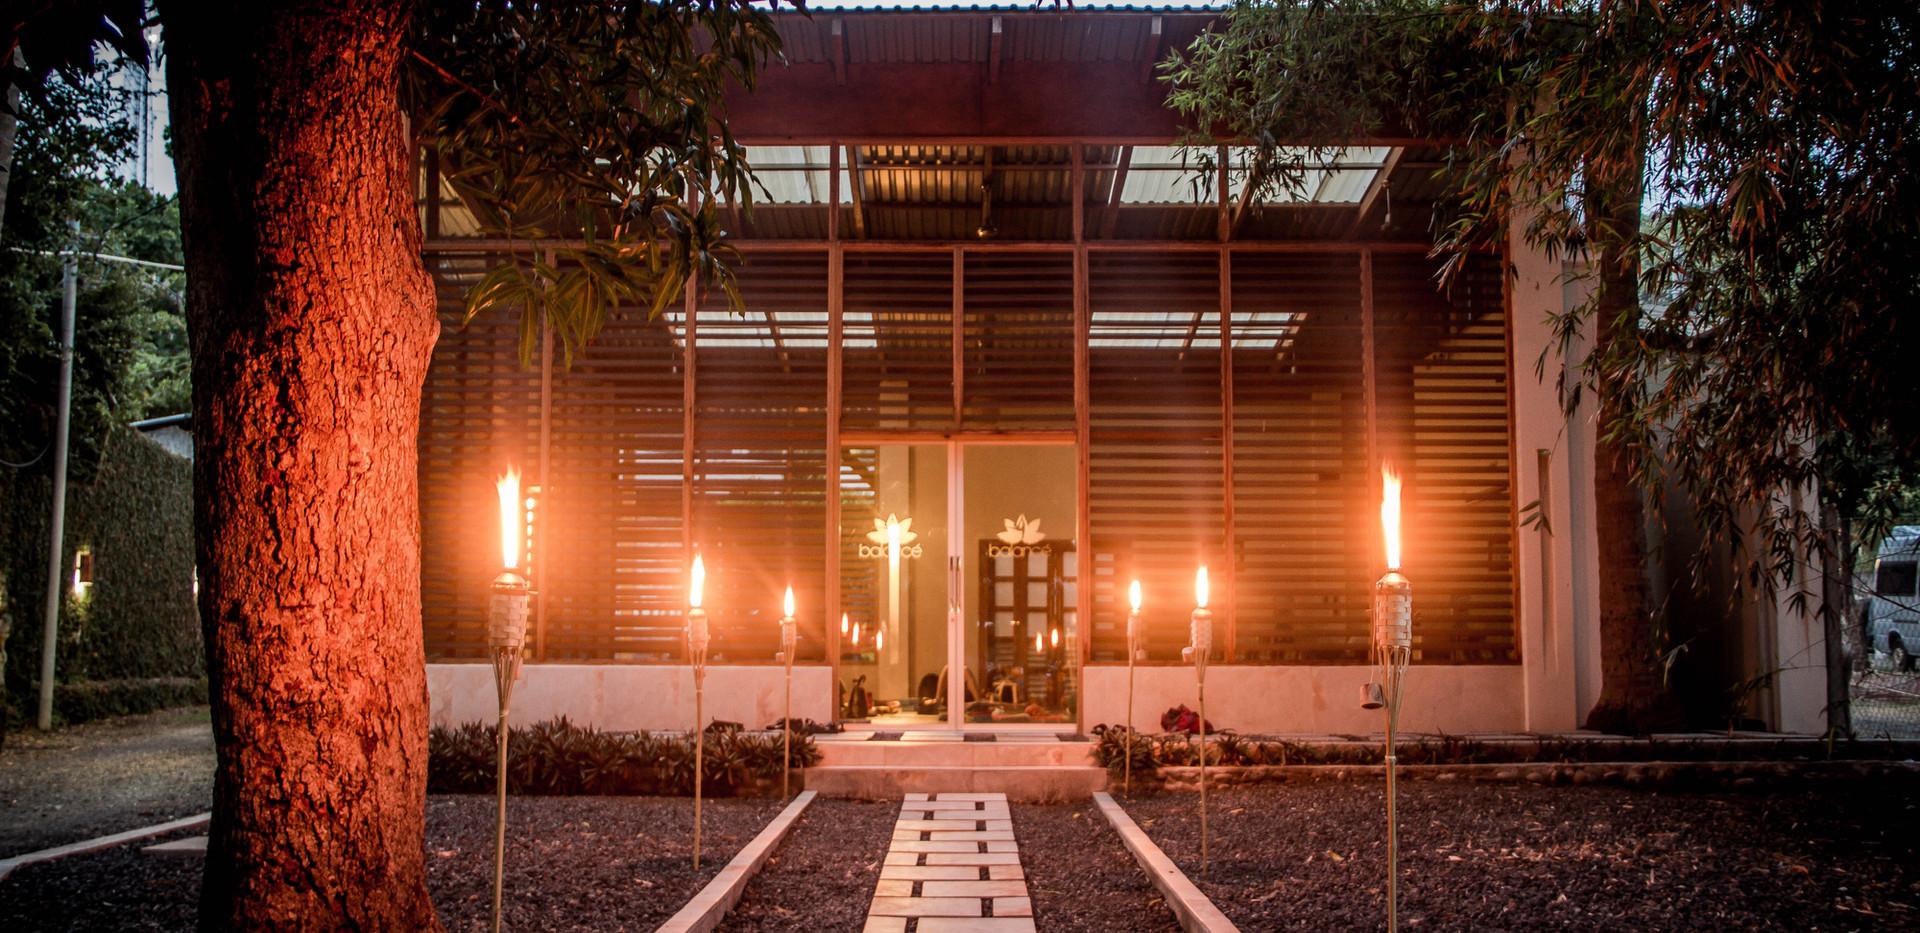 B Yoga - Balance studio facade with torc